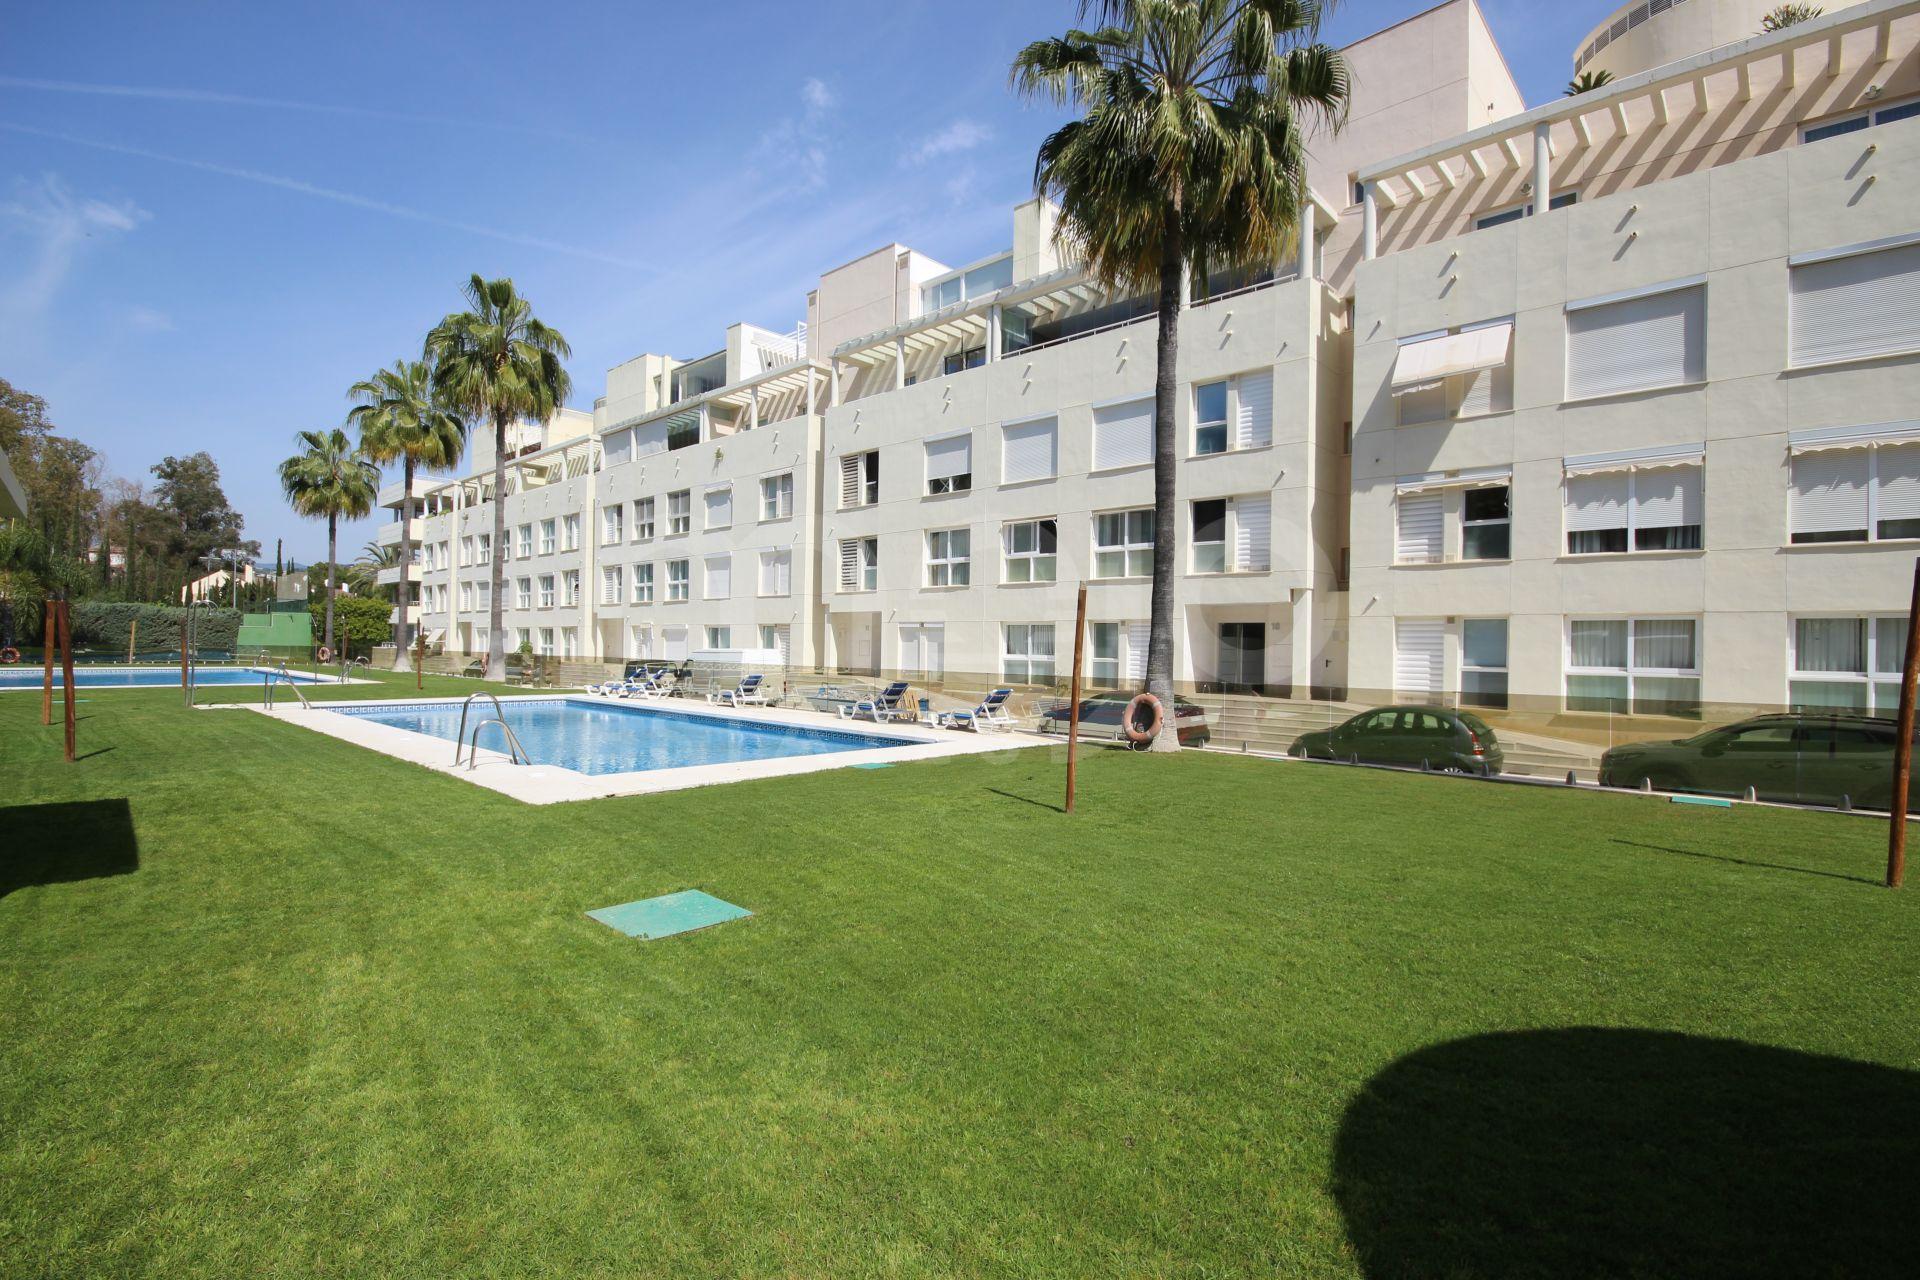 Lejlighed til salg i La Corniche, Nueva Andalucia